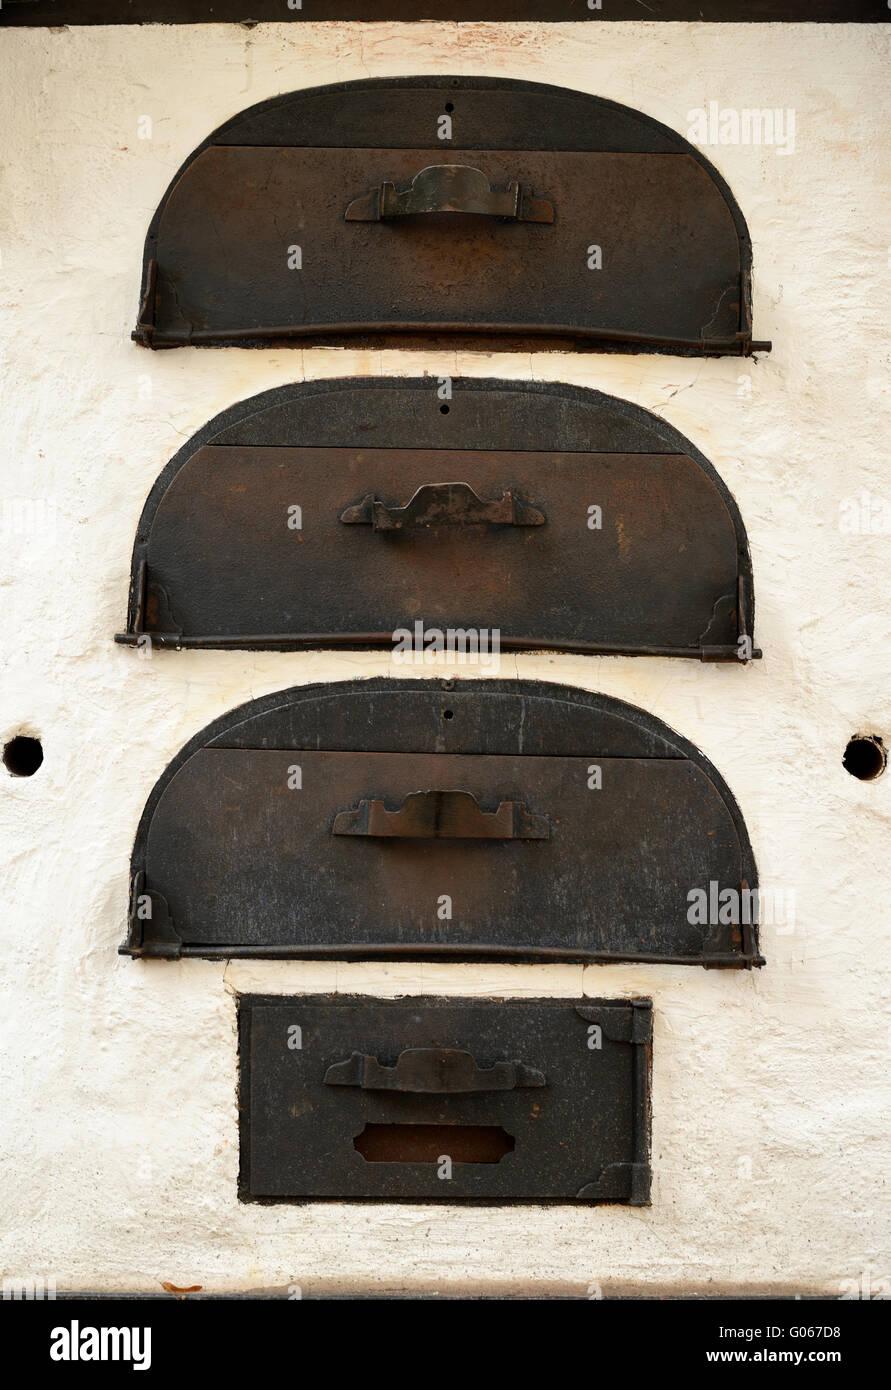 baking oven - Stock Image